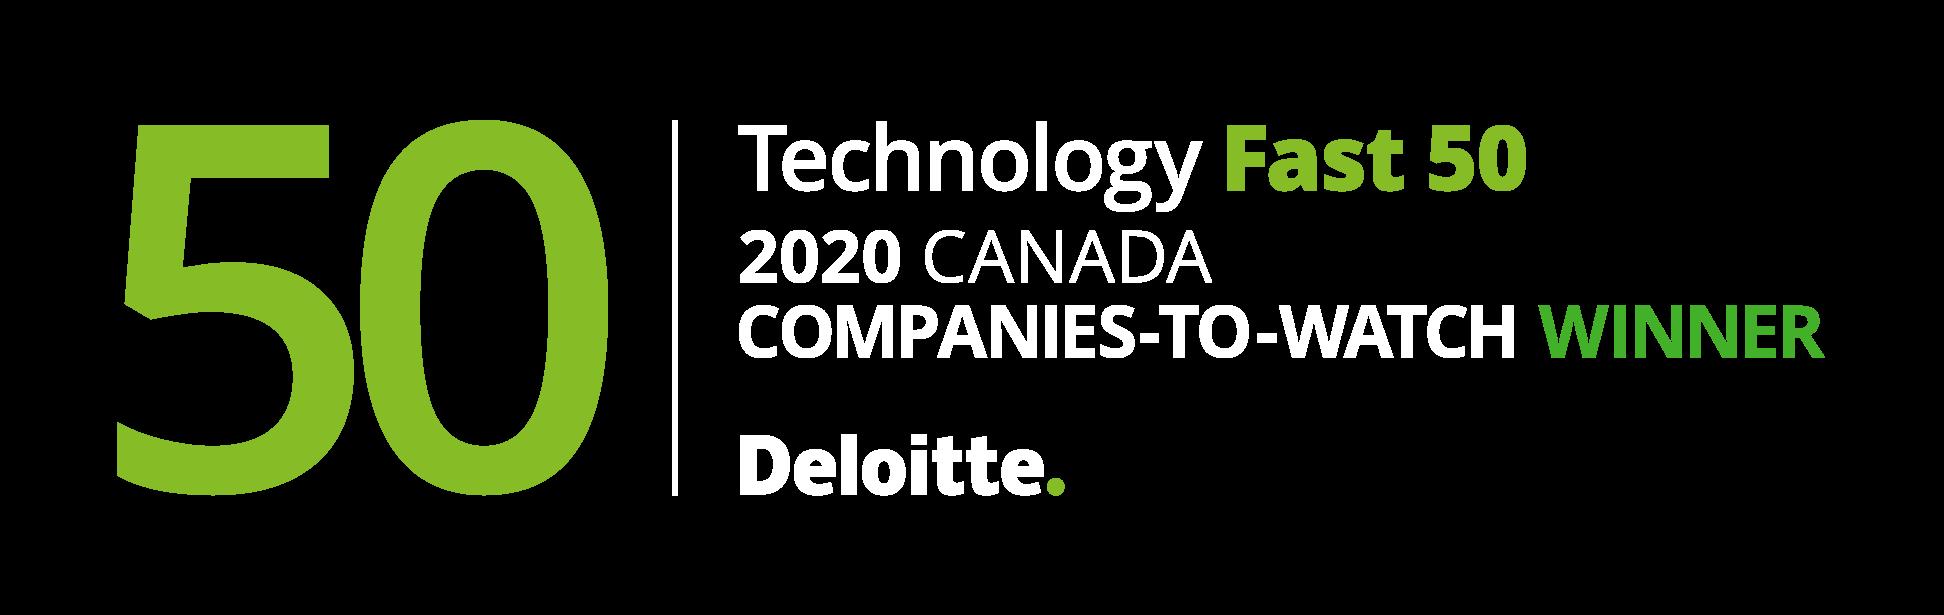 Deloitte Technology Fast 50 2020 Canada Companies-to-Watch award